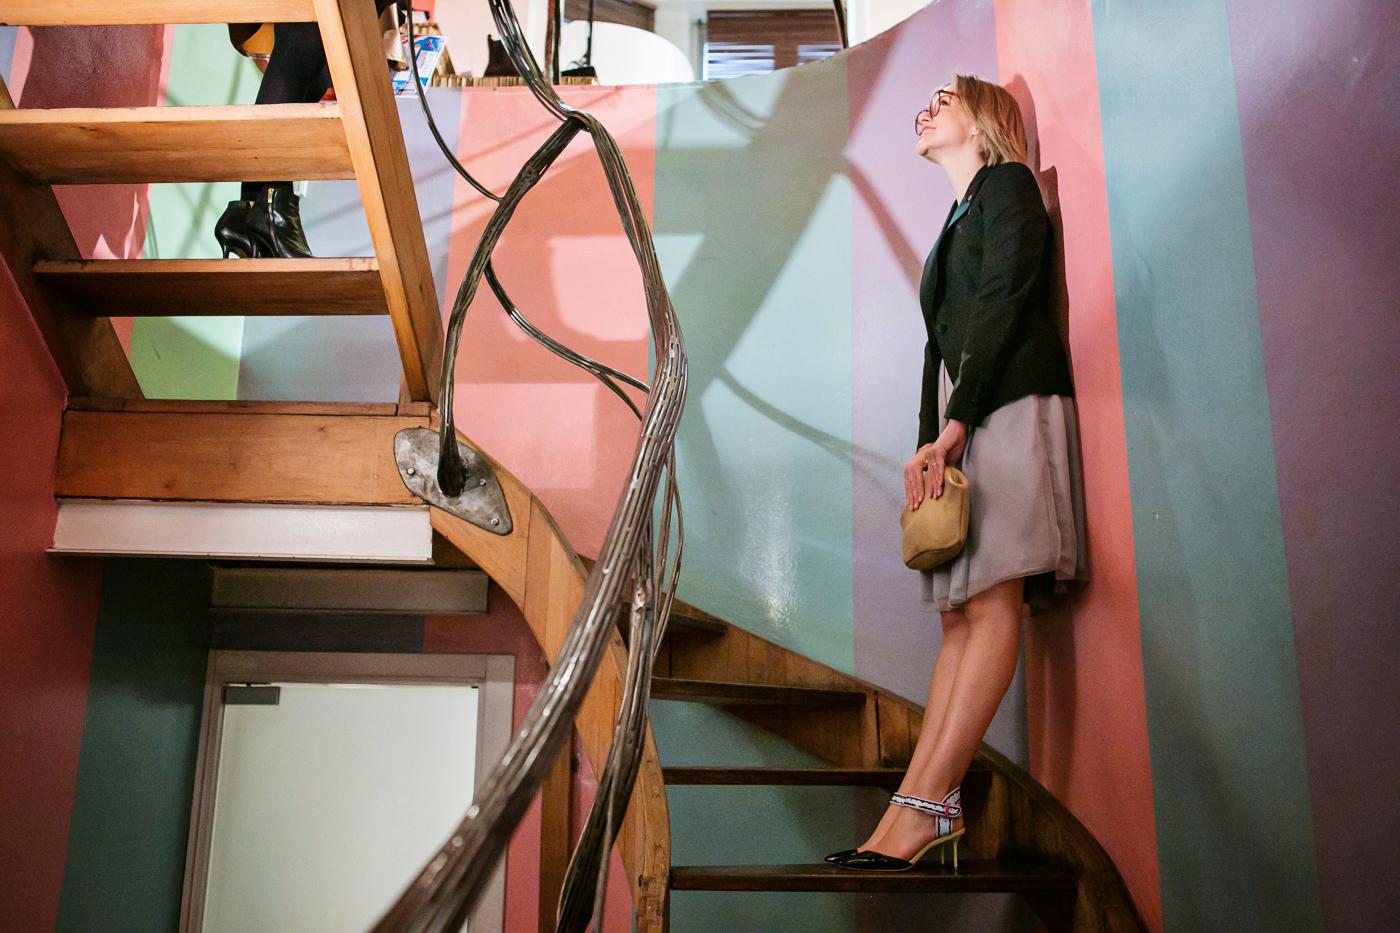 darya kamalova from thecablook com on lardini presentation in Milan and in attila showroom wearing lardini perfect black jacket with marni retro clutch and sophia webster kitten heels-72